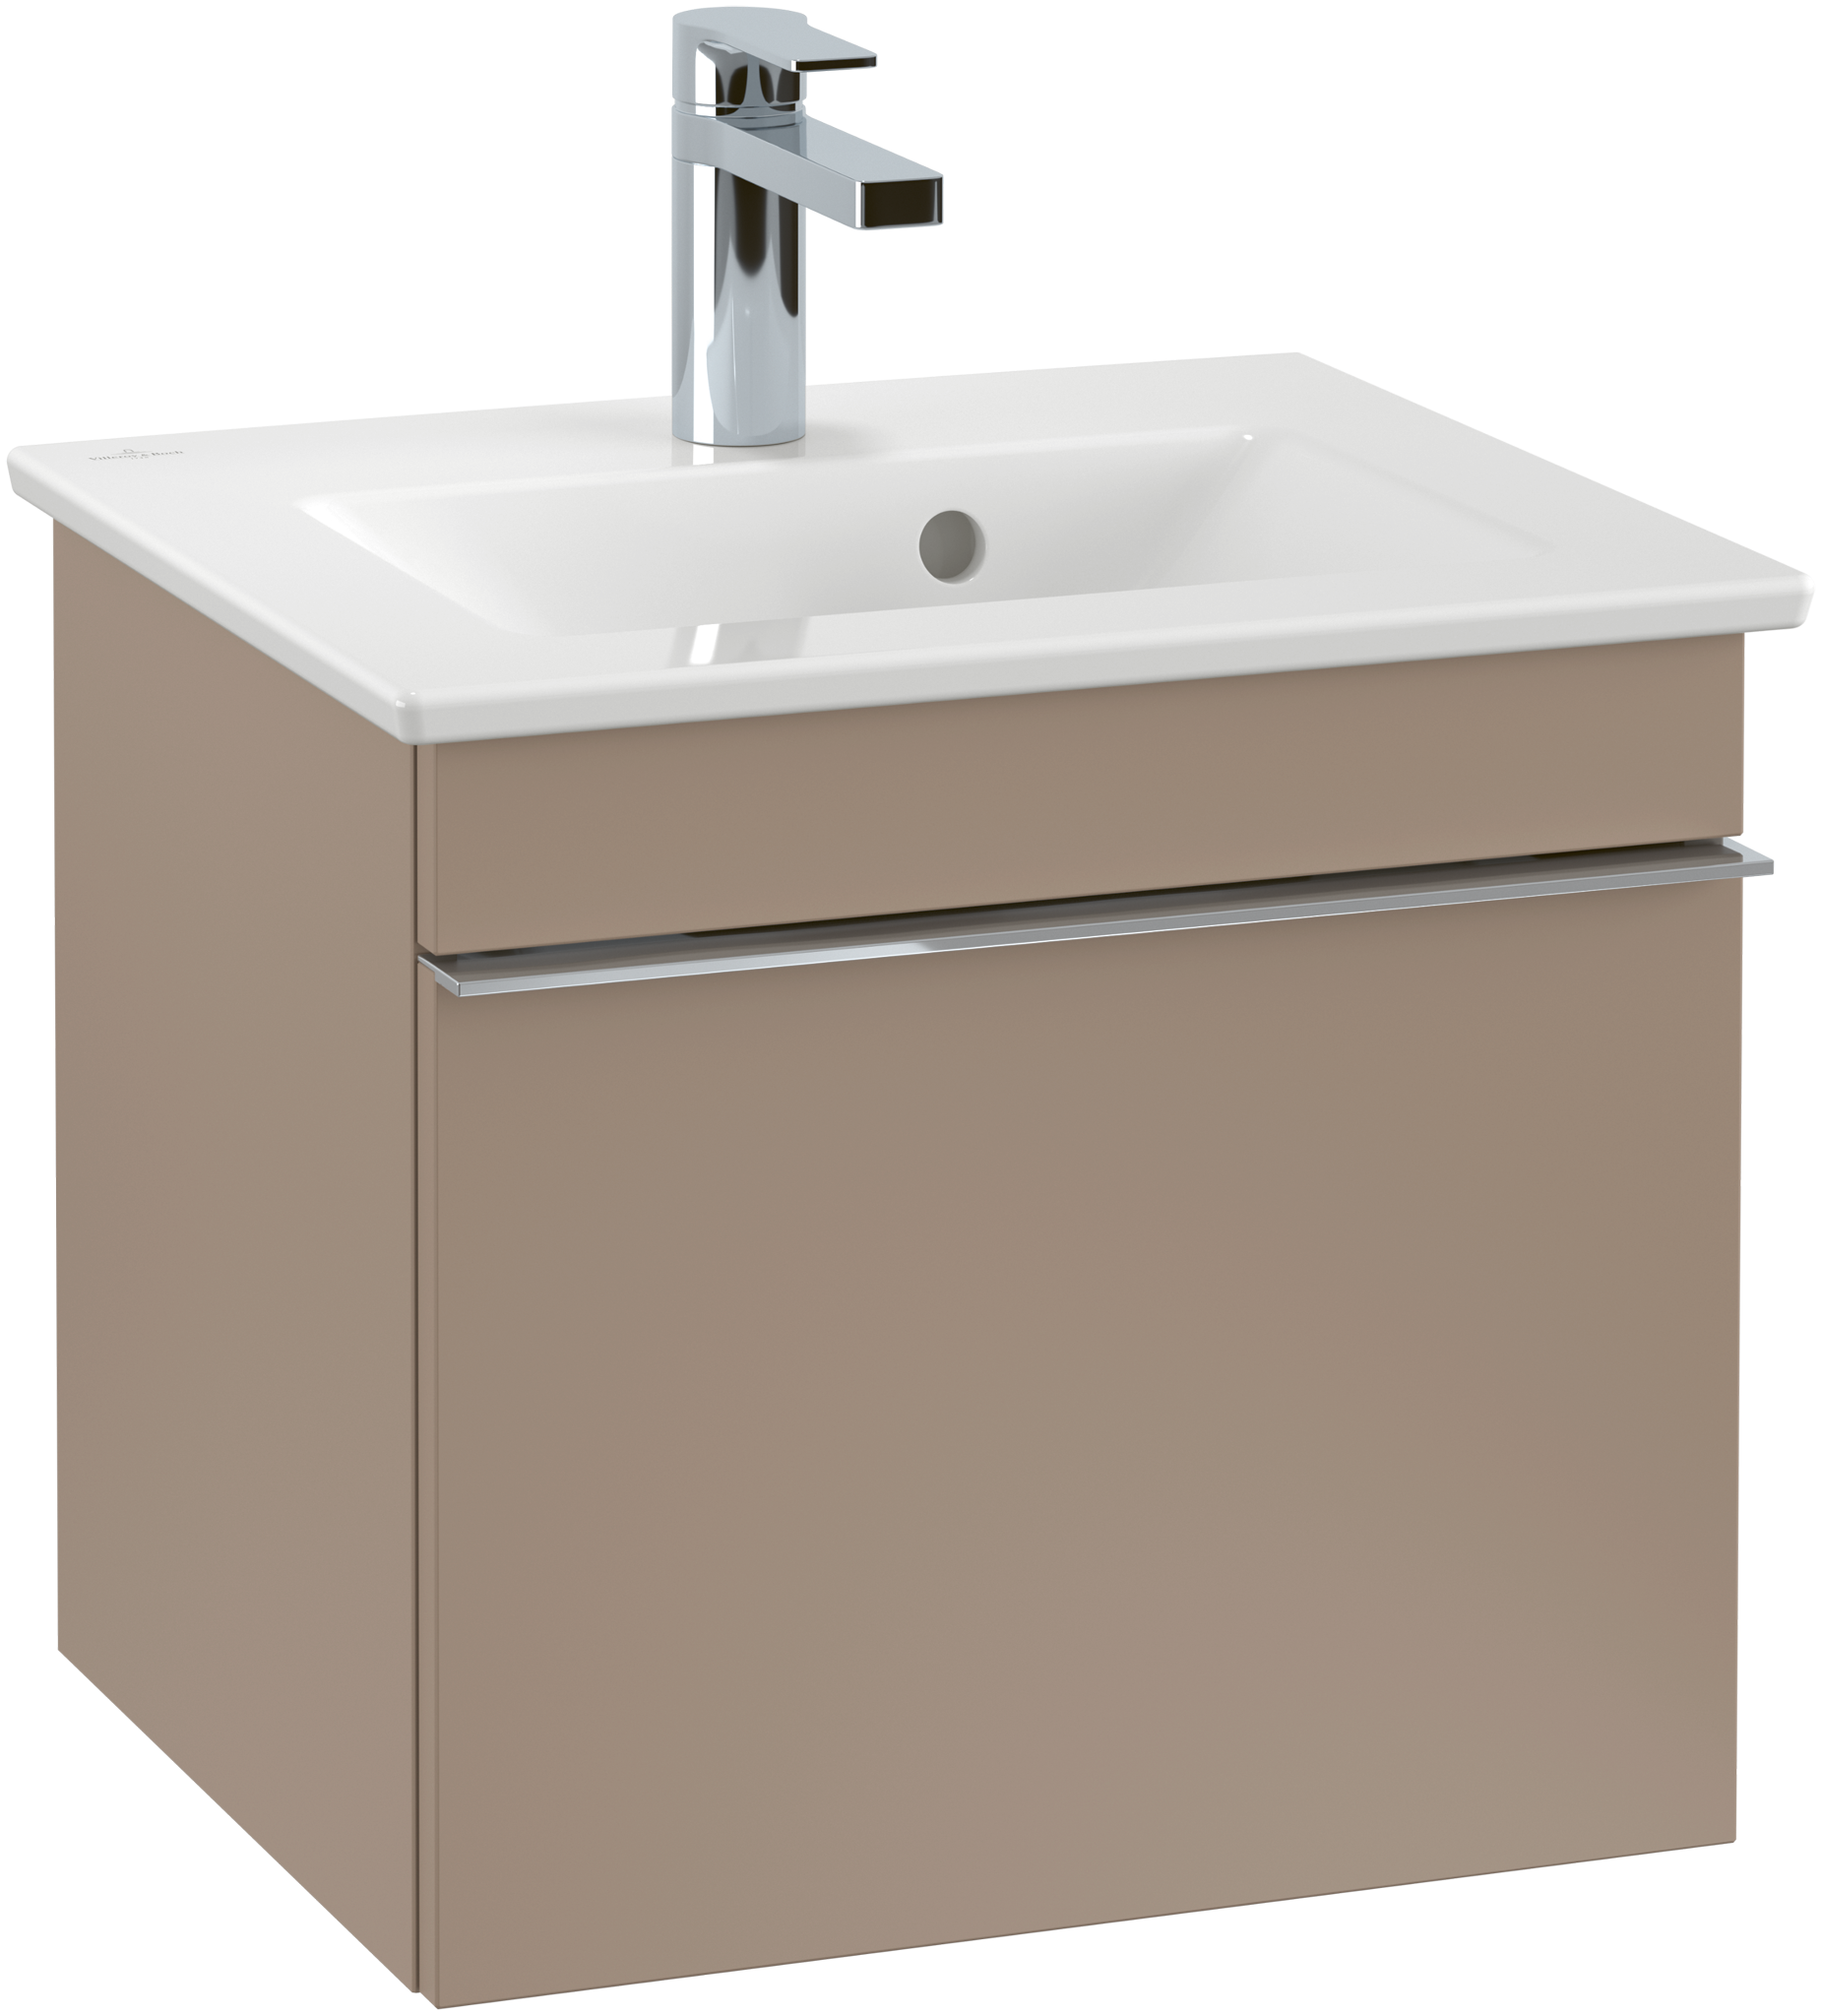 Bathroom sink and vanity unit - Venticello Bathroom Furniture Vanity Unit For Washbasin Bathroom Sink Cabinets